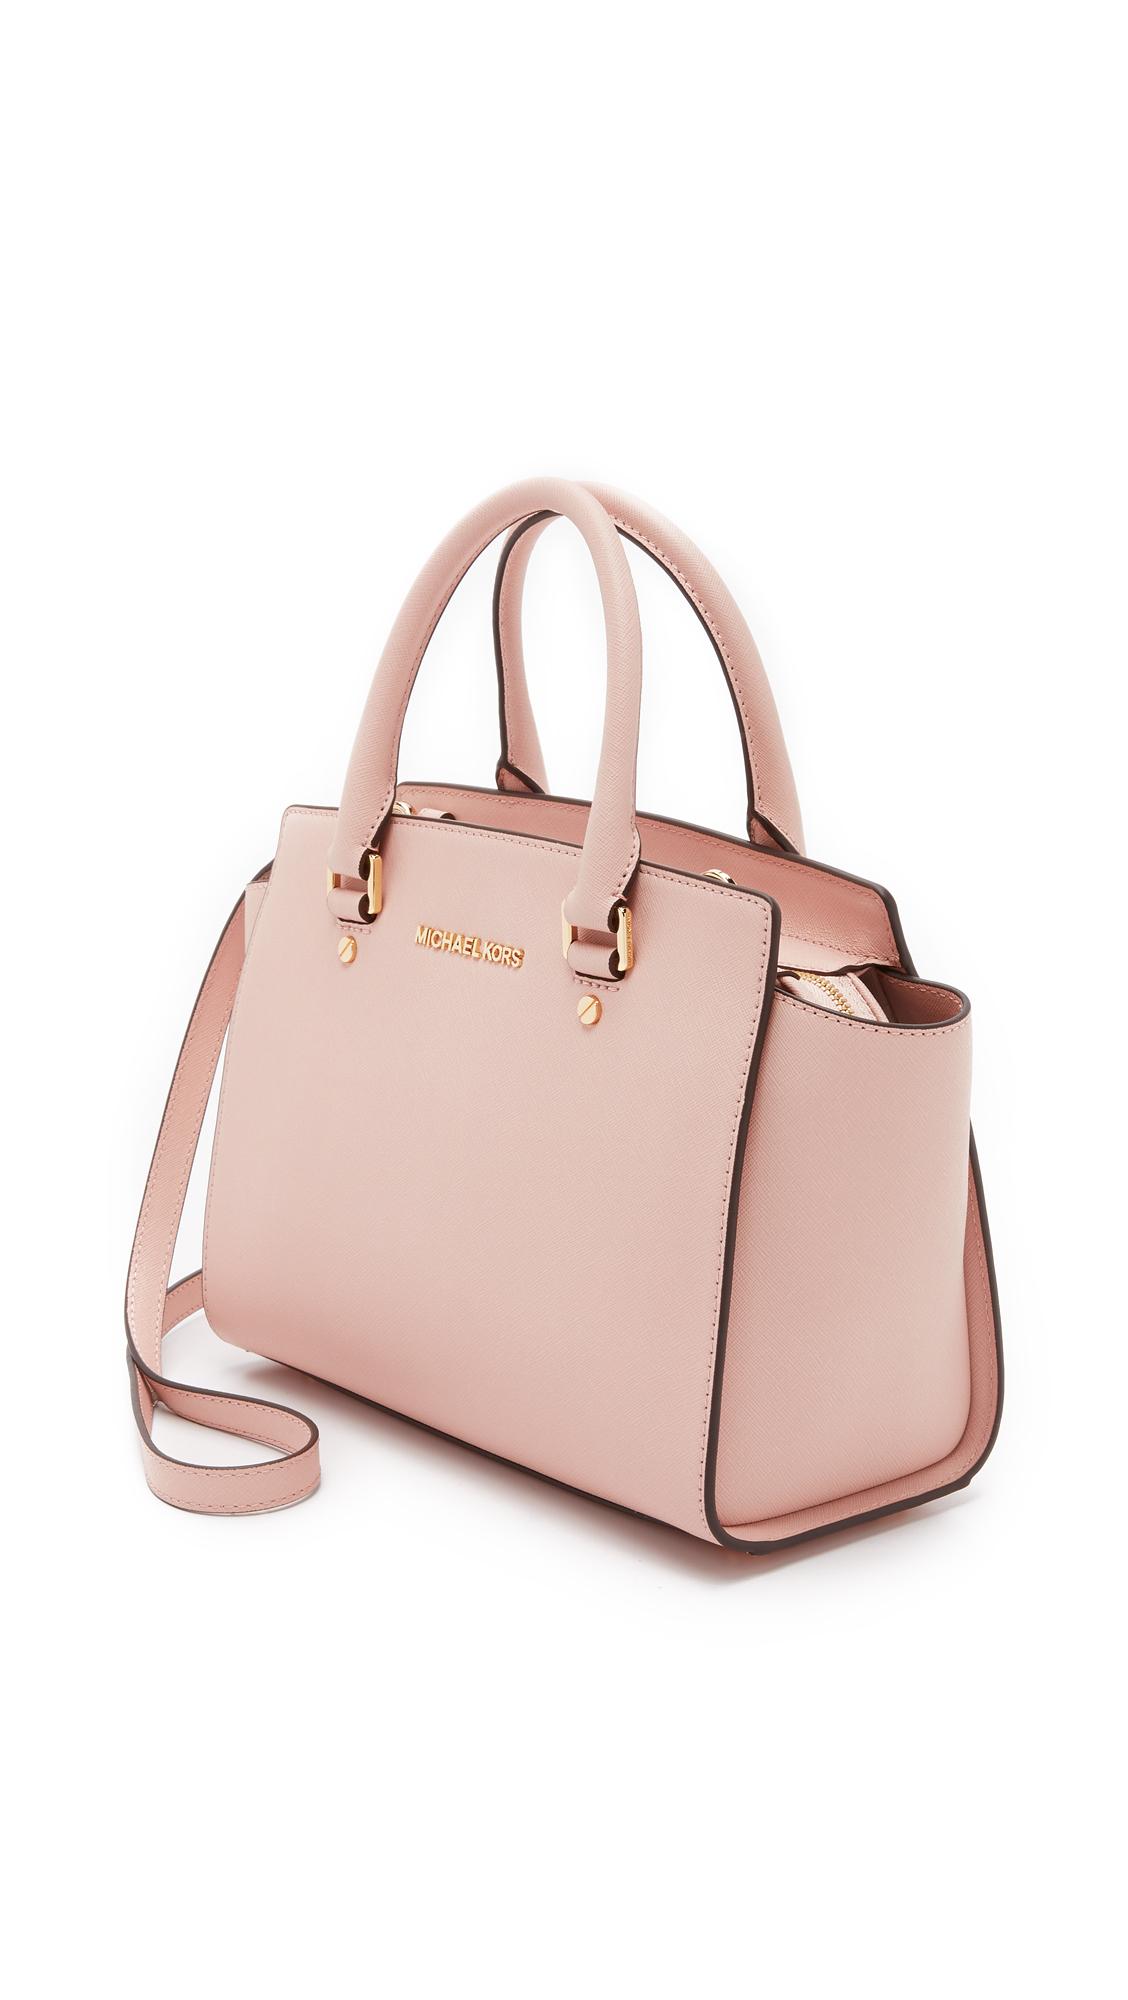 dcc279519375 ... france lyst michael michael kors selma medium satchel ballet in pink  9079e e4ca7